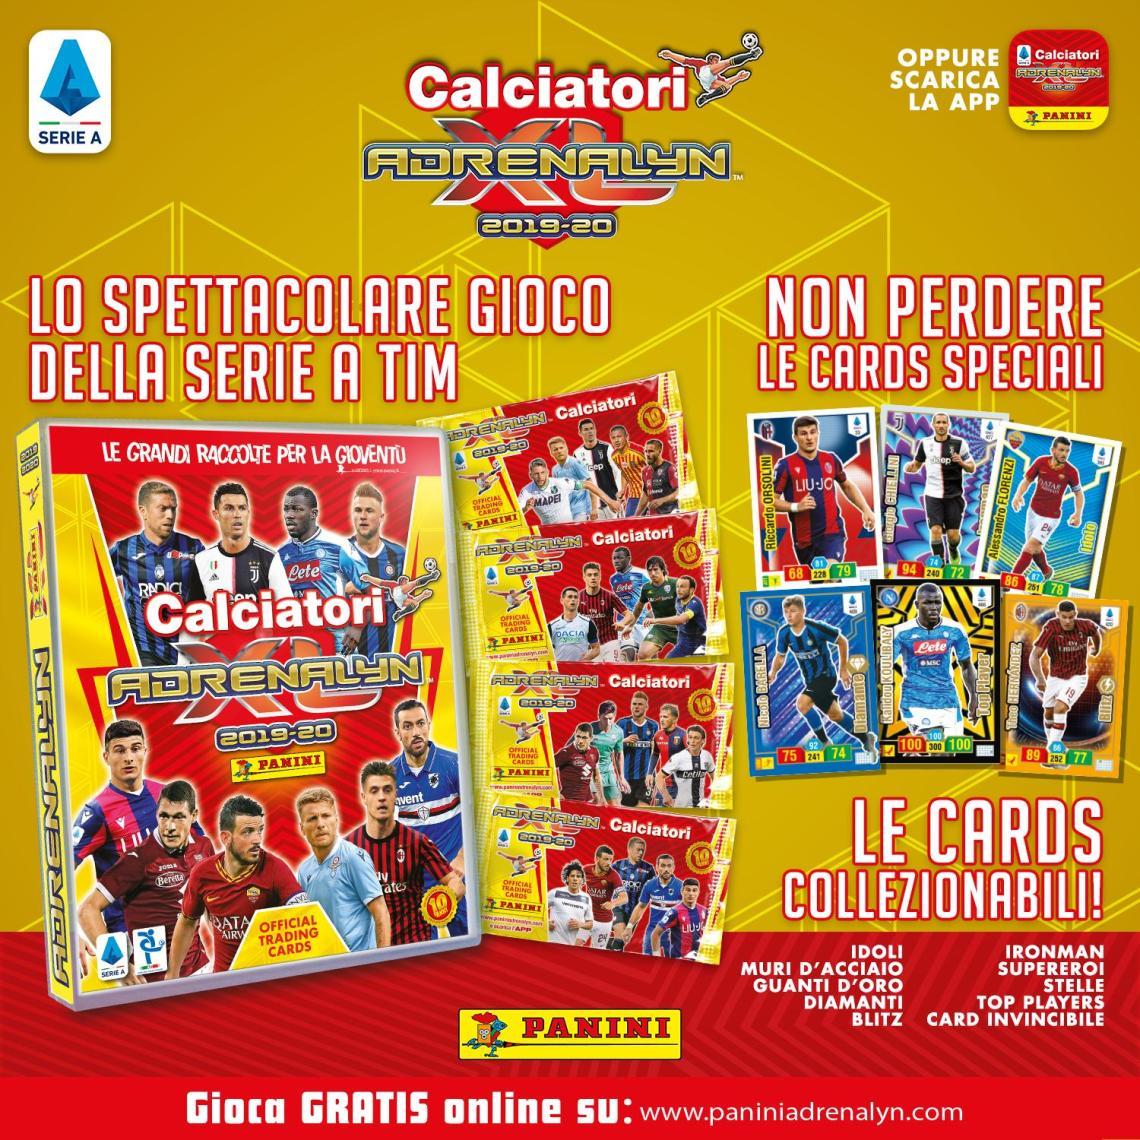 PANINI ADRENALYN XL CALCIATORI 2019-20 ANNONCE TWITTER GENERAL